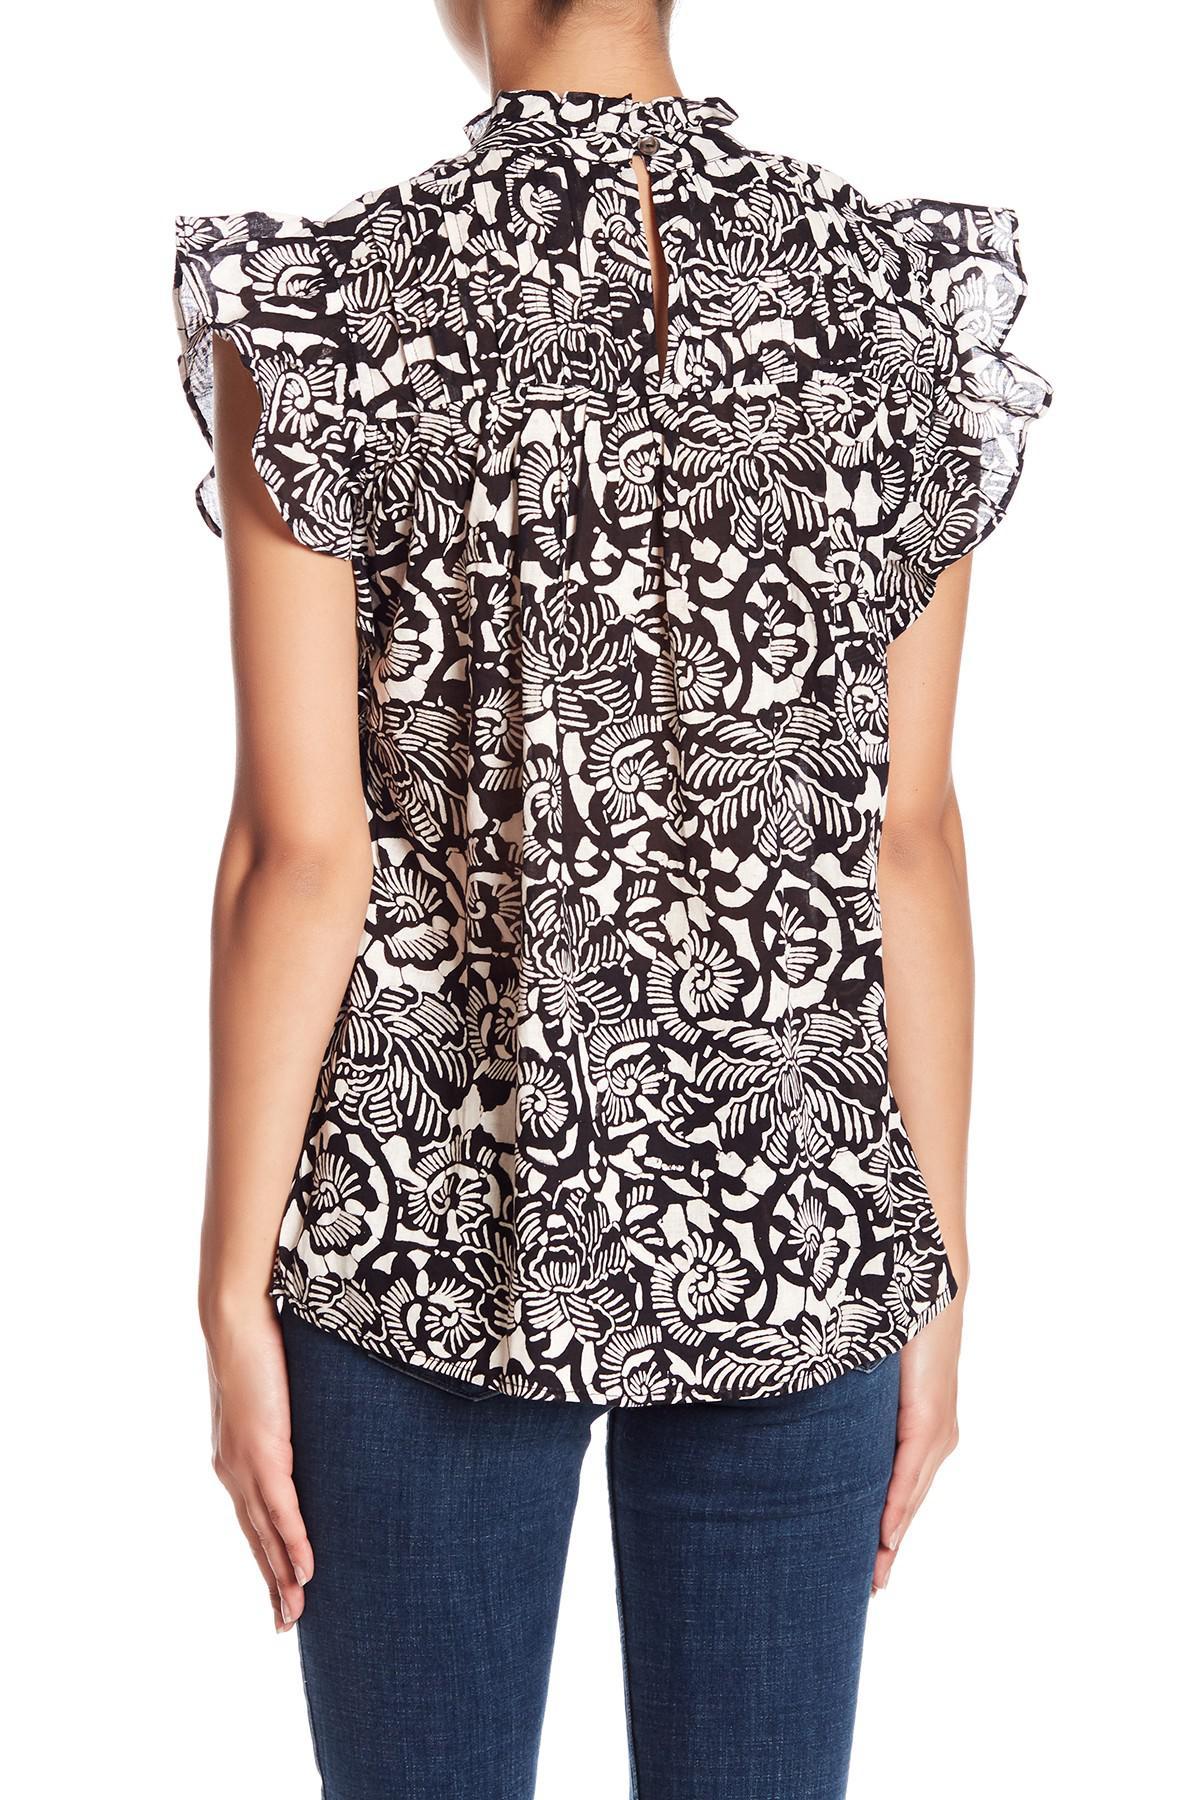 d6fcb9bb271d68 Lyst - Banjanan Printed Ruffle Sleeve Blouse in Black